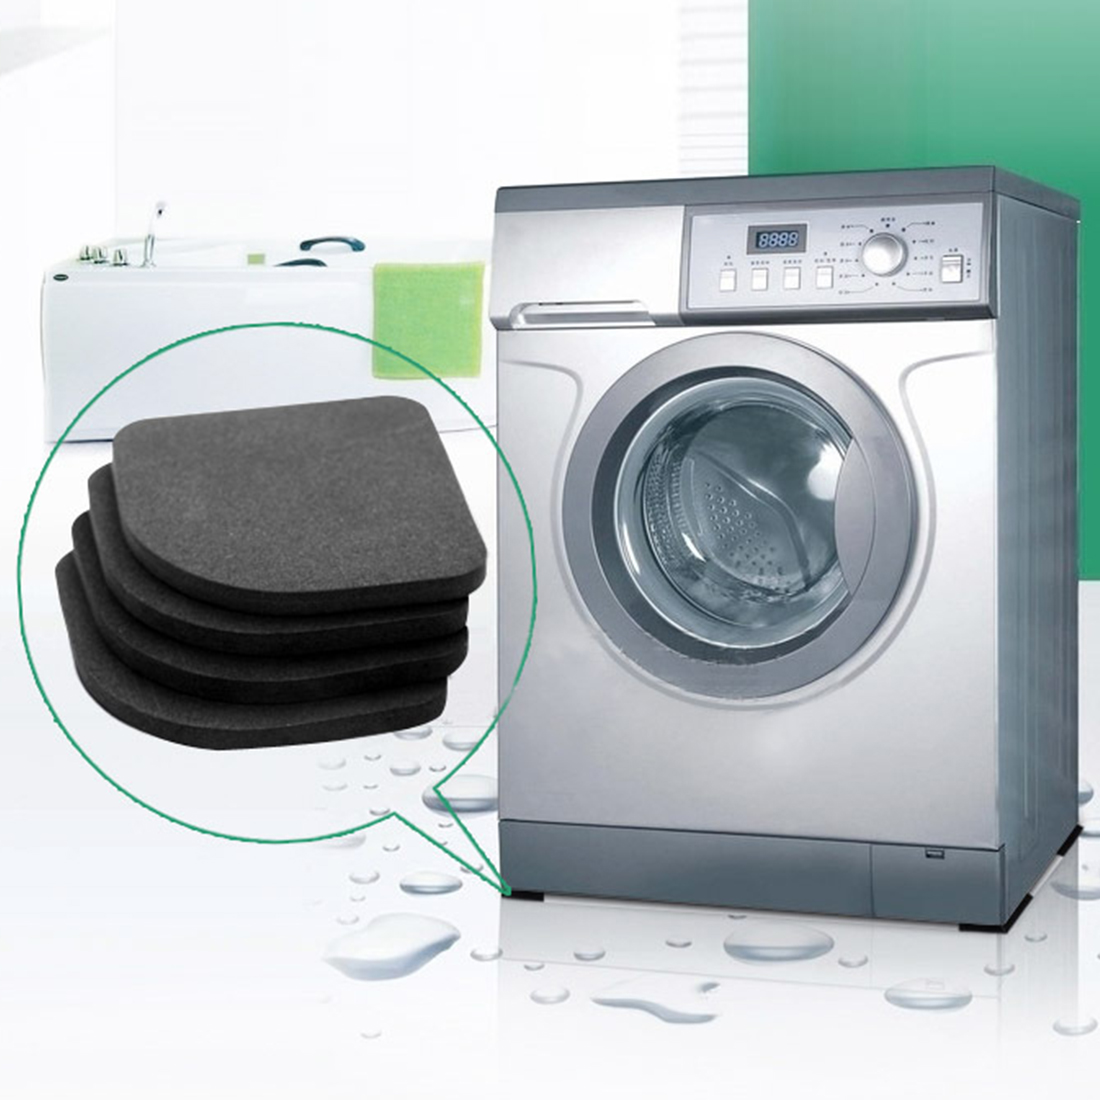 Beauty & Health Industrious Practical Eco-friendly Washing Machine Shock-absorption Pads Refrigerator Non-slip Anti-vibration Mats 4pcs/set Bathroom Tool Toiletry Kits